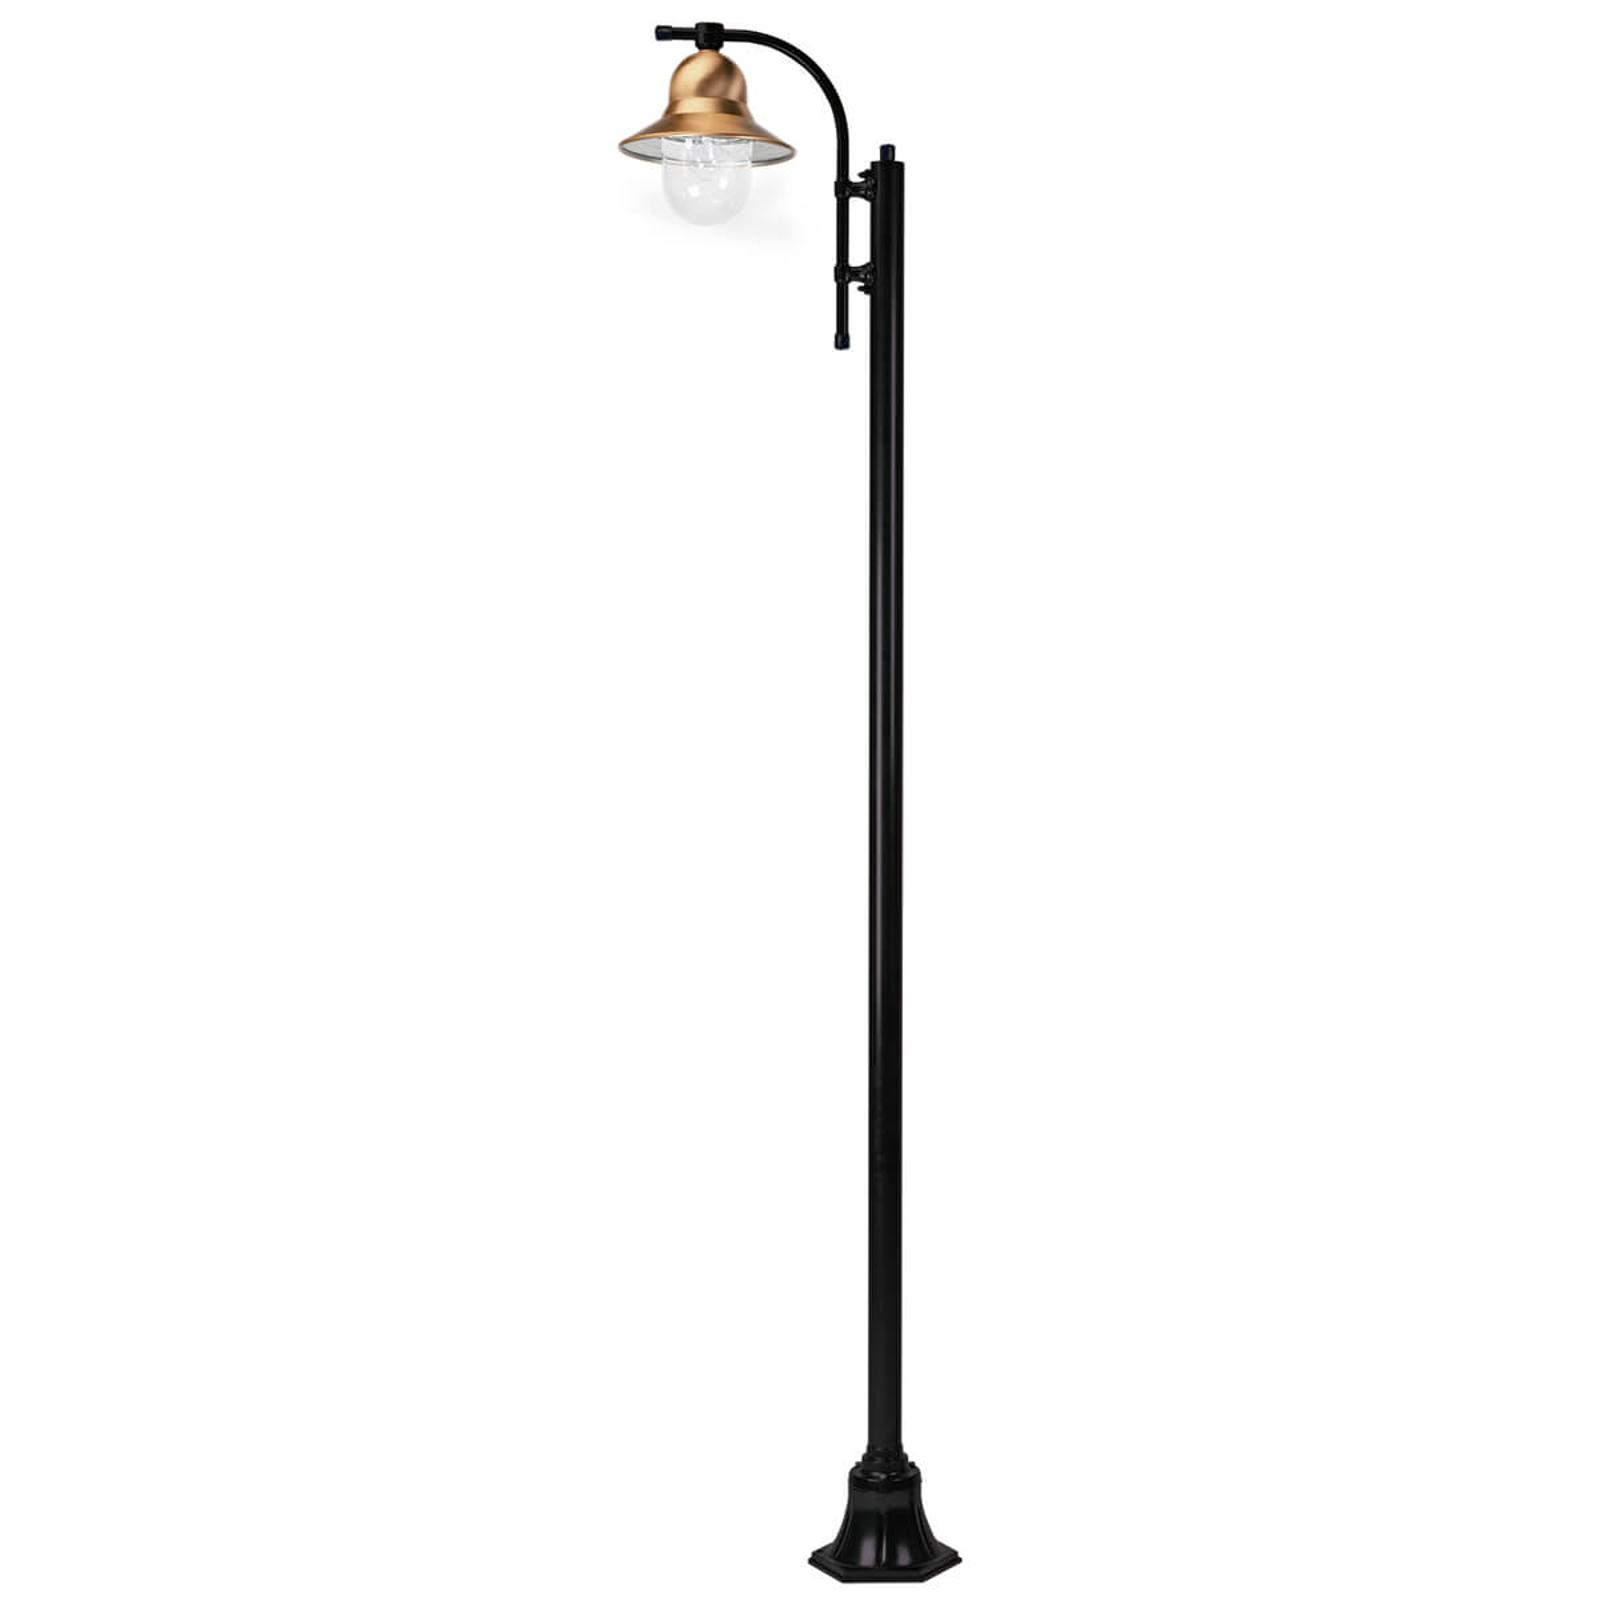 1-punktowa latarnia Toscane 240 cm, czarna